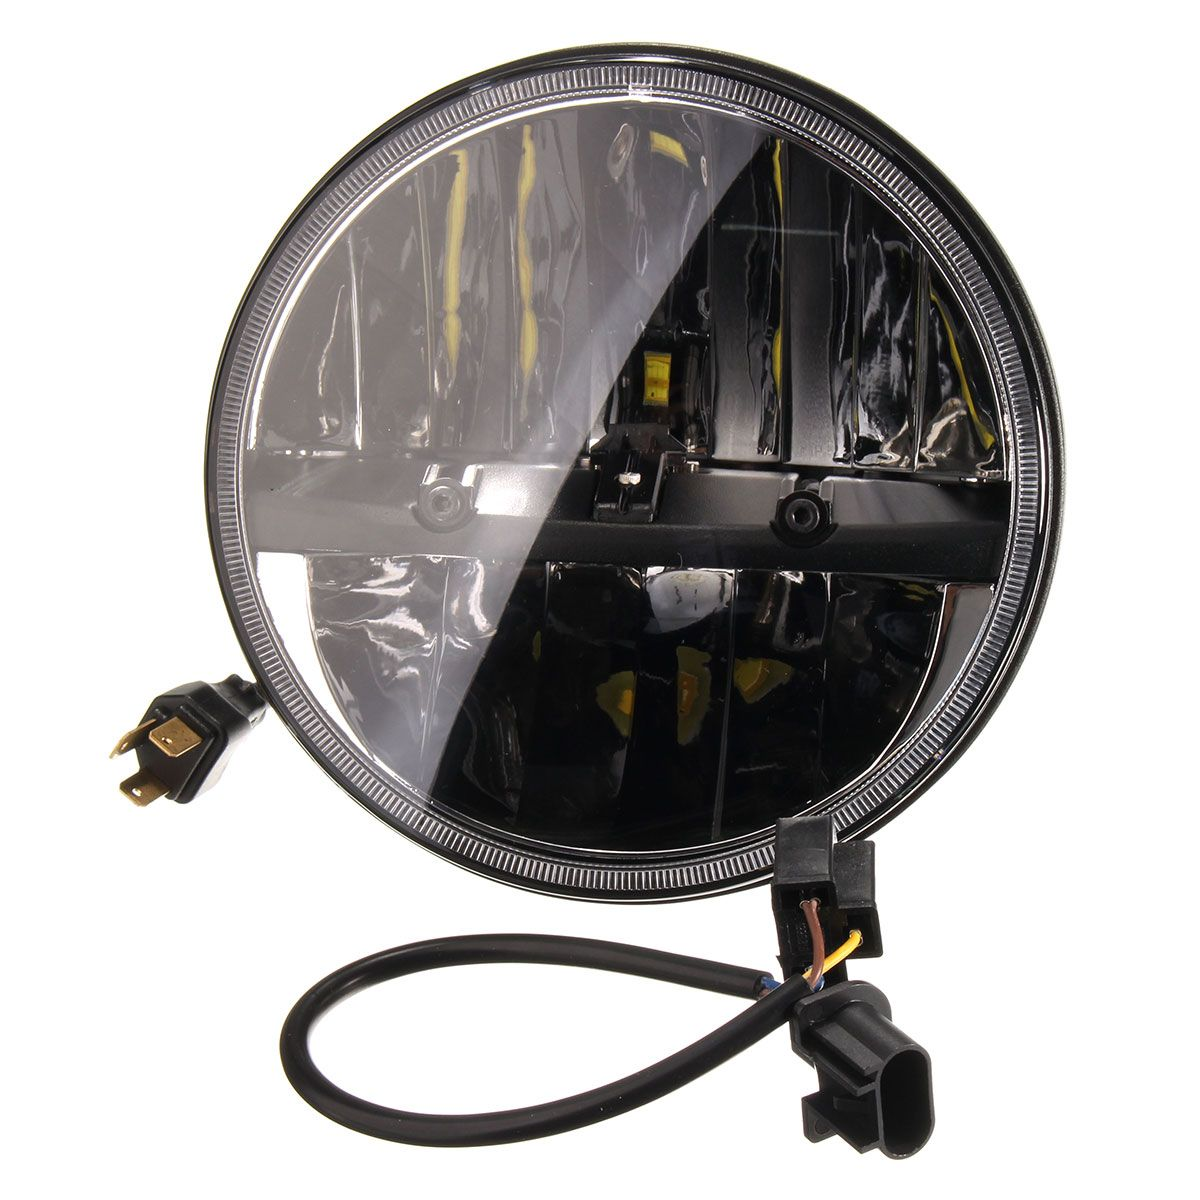 1 Set 7 Inches 10V-30V 20W 6000K Motor Motorcycle Running Light HeadLight For Harley/Davidson